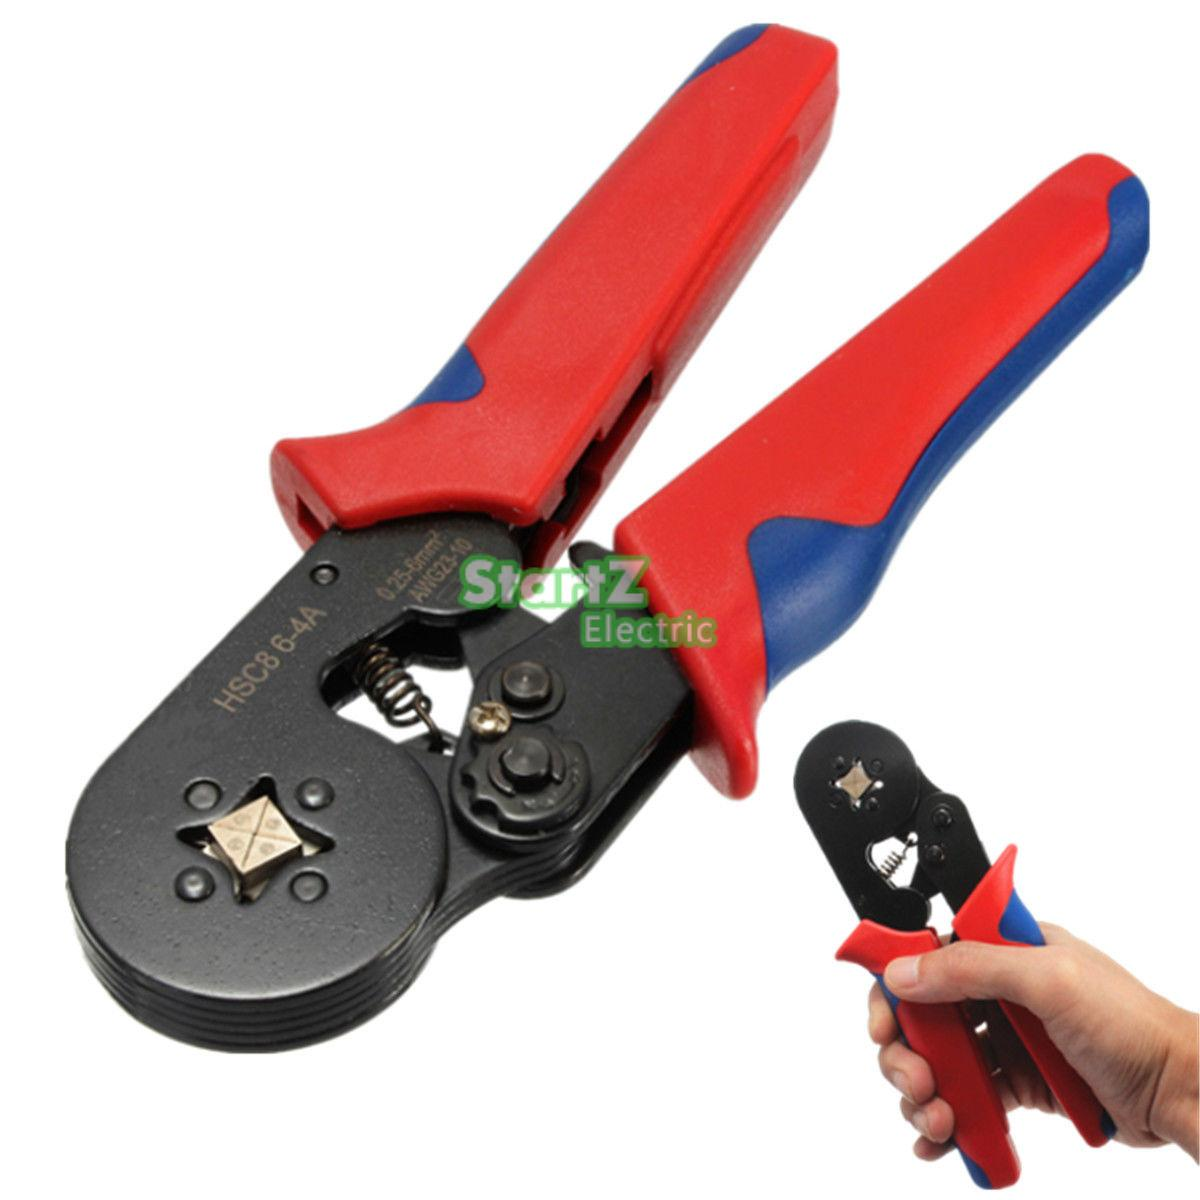 Self Adjusting Ratcheting Ferrule Crimper Plier HSC8 6-4A 0.25-6mm2 AWG23-10 awg24 10 cable end sleeves crimping plier c 0816 self adjusting ratcheting ferrule crimper0 25 16mm2